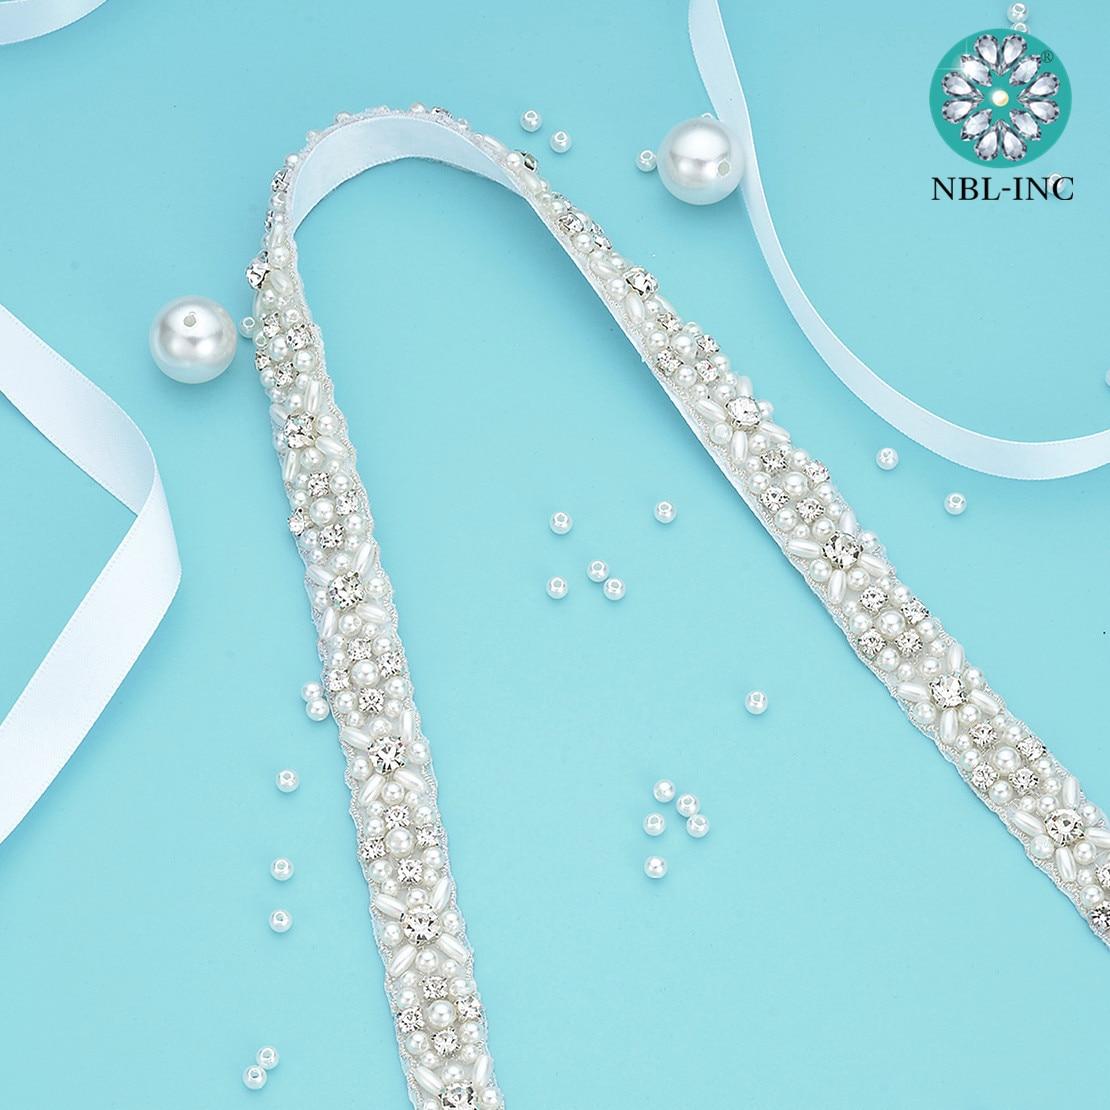 (1PC) Rhinestones bridal belt diamond wedding dress belt with crystal wedding sash for wedding dress accessories WDD1058